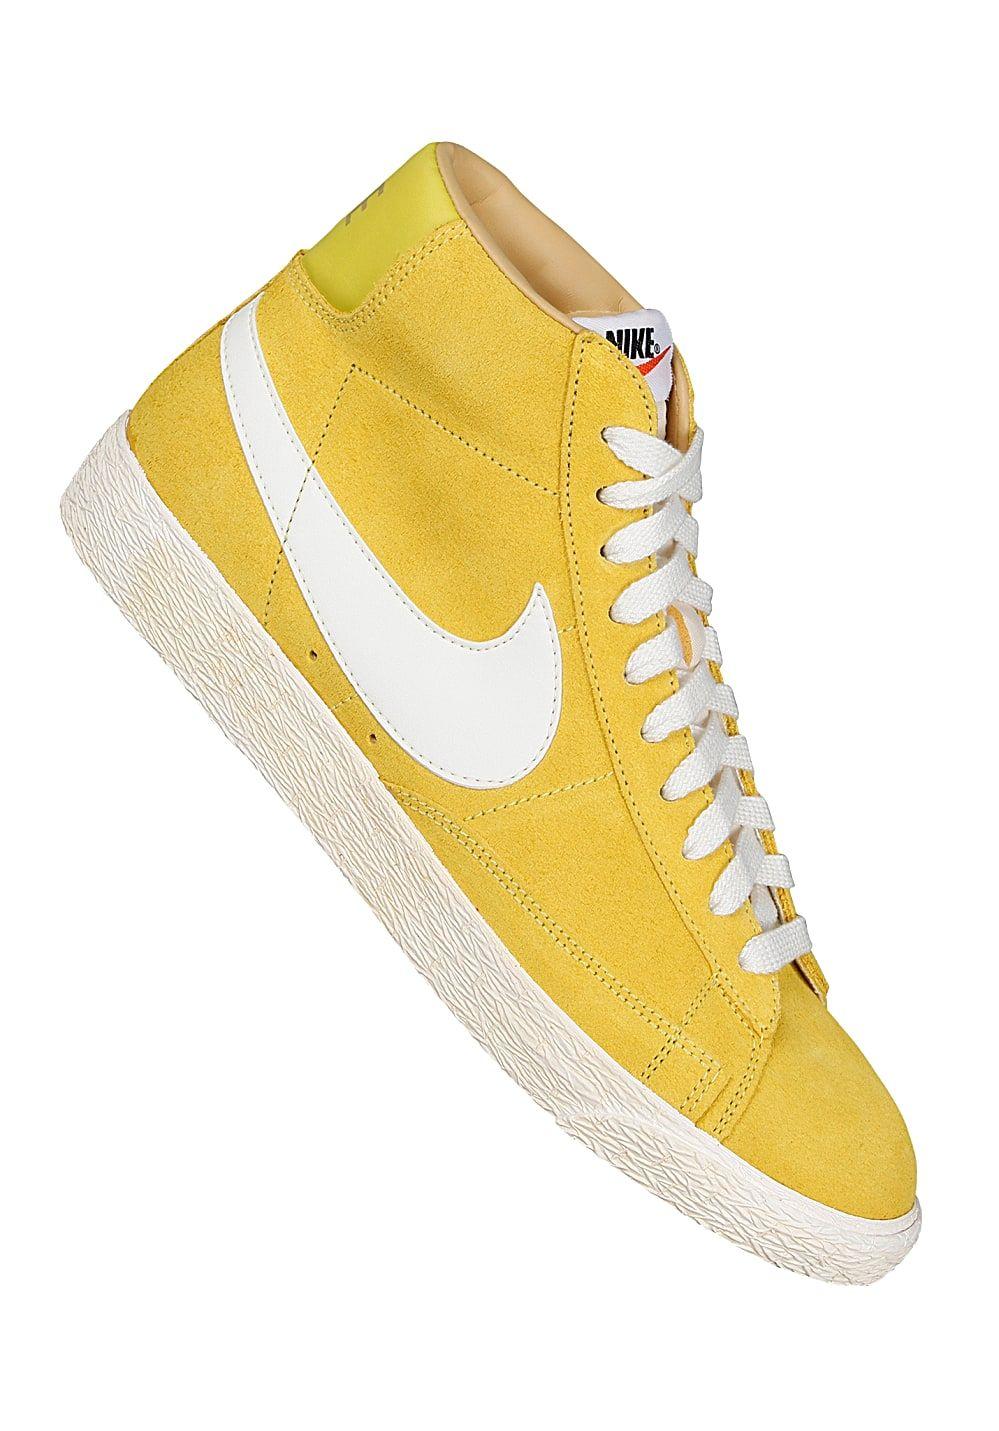 Nike Sneaker Gelb Herren Schuhe Pinterest Schuhe Sneaker Gelb